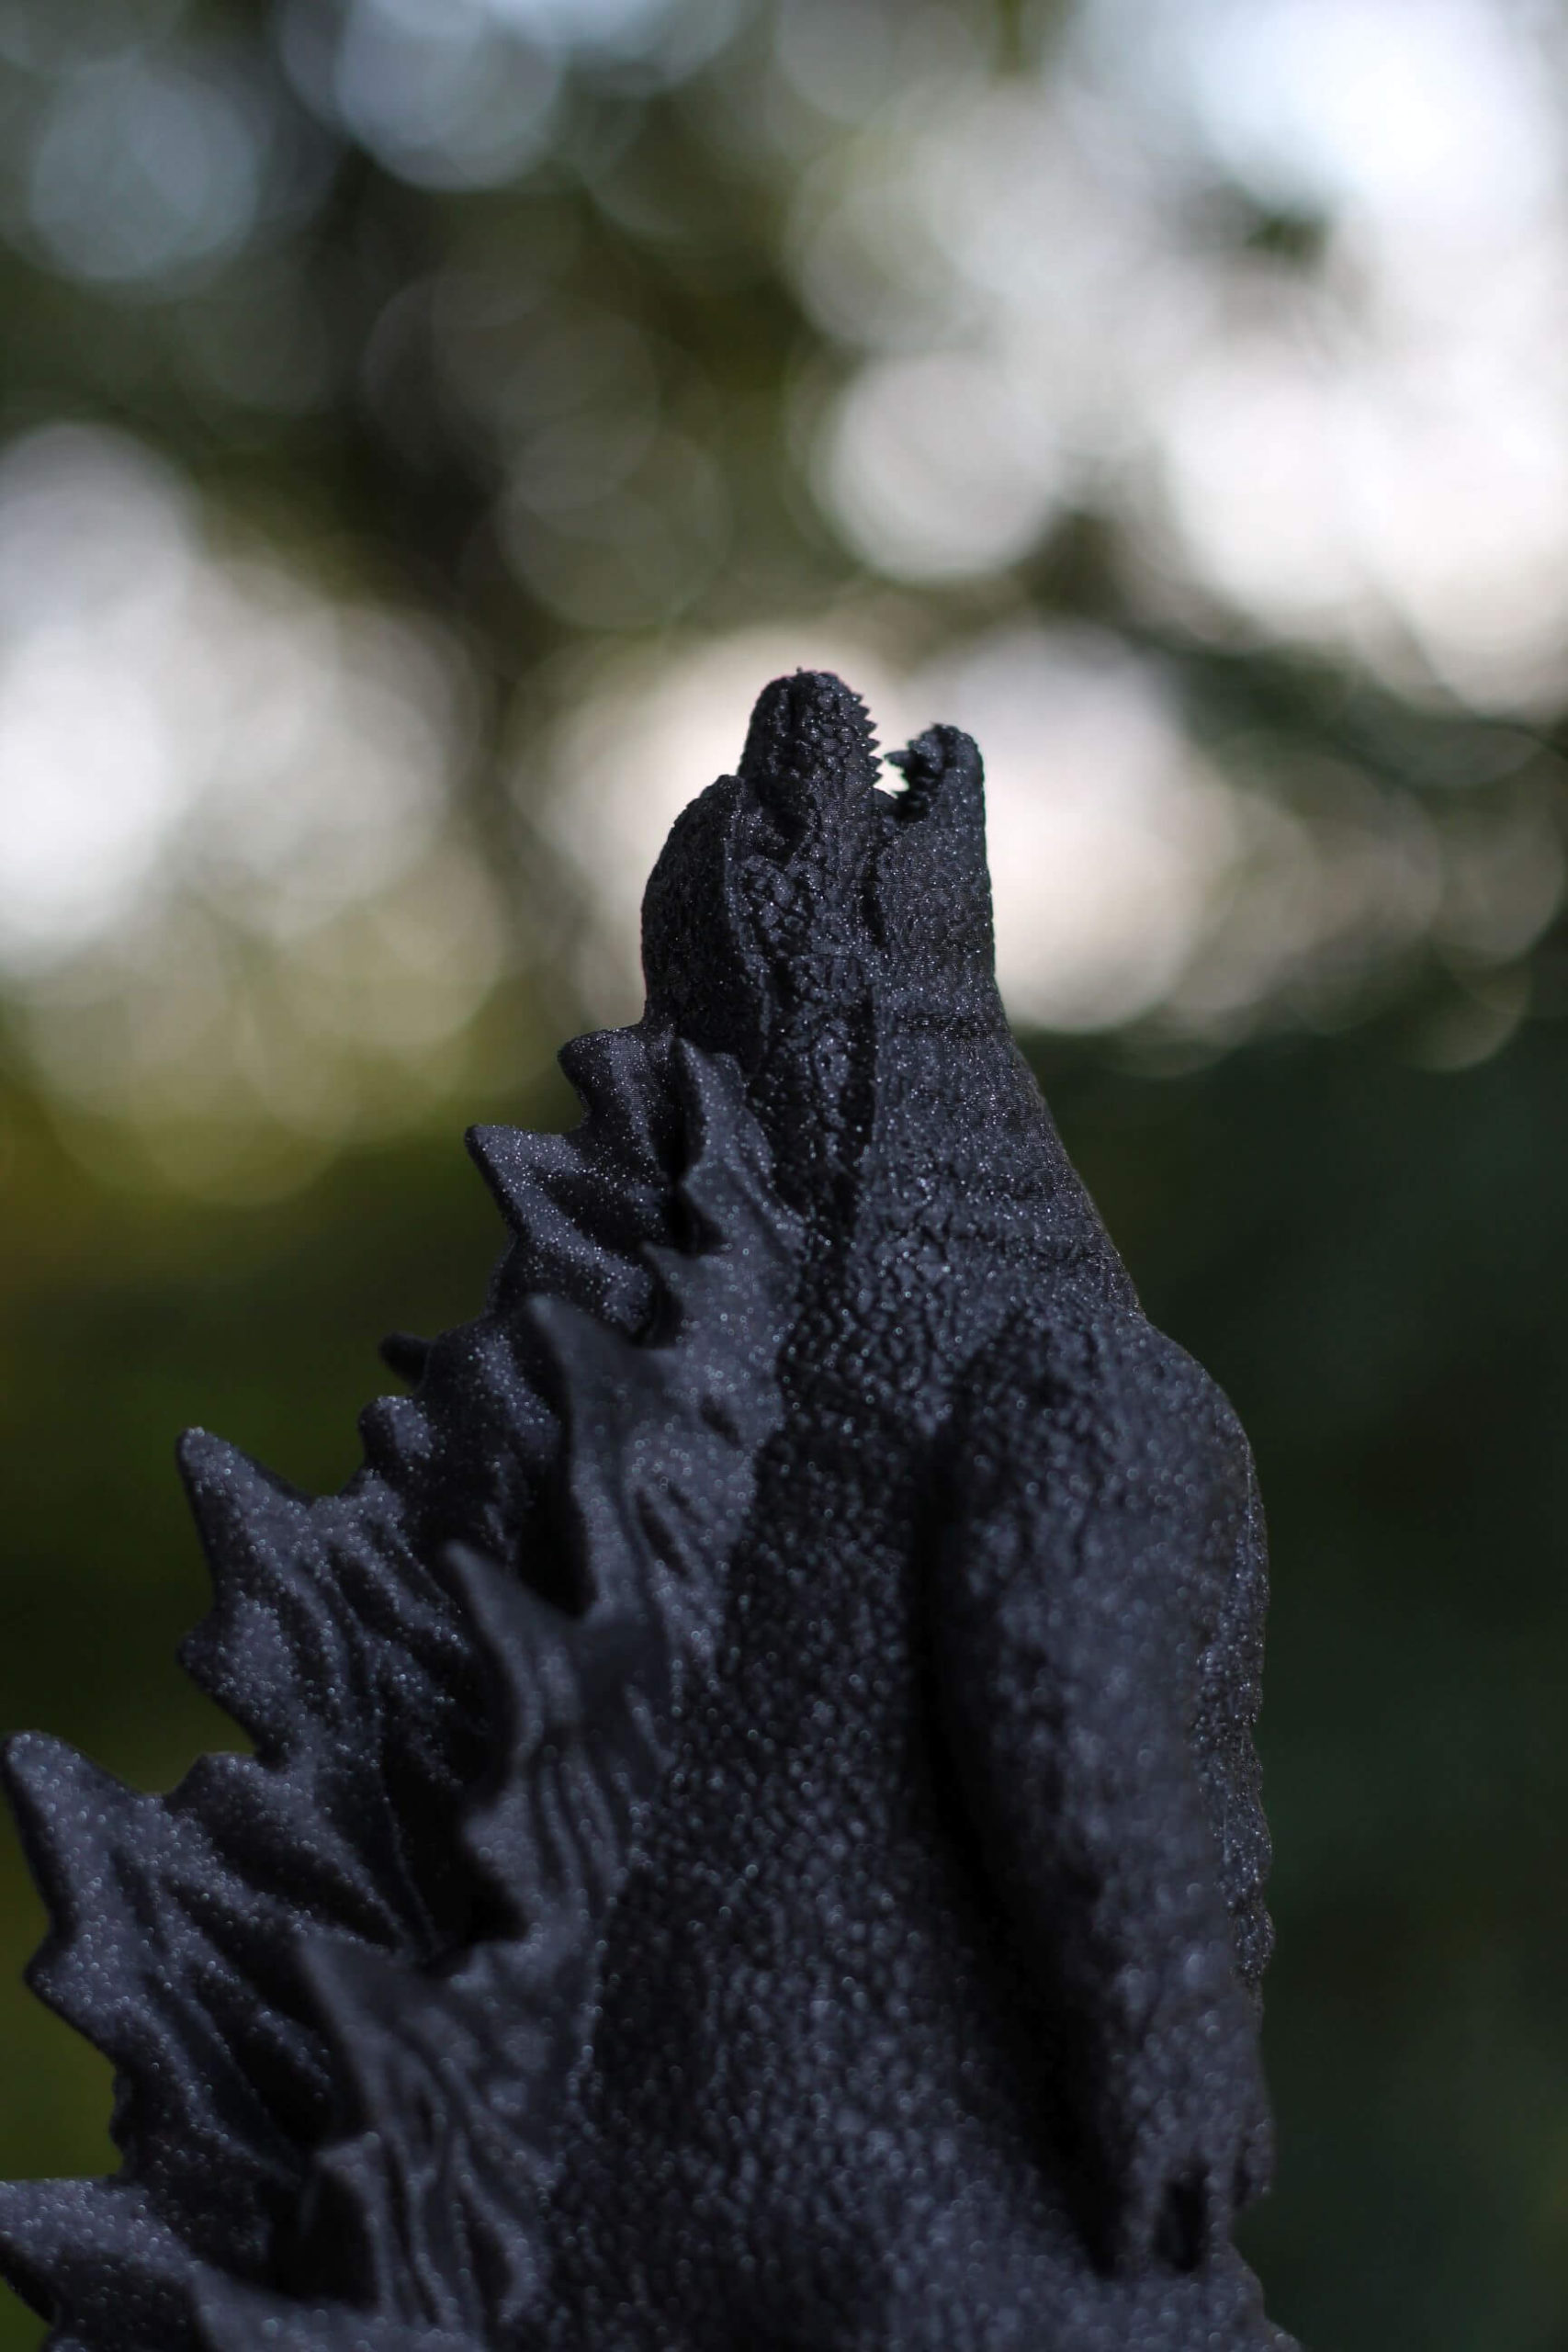 Godzilla-on-CR-6-SE-4